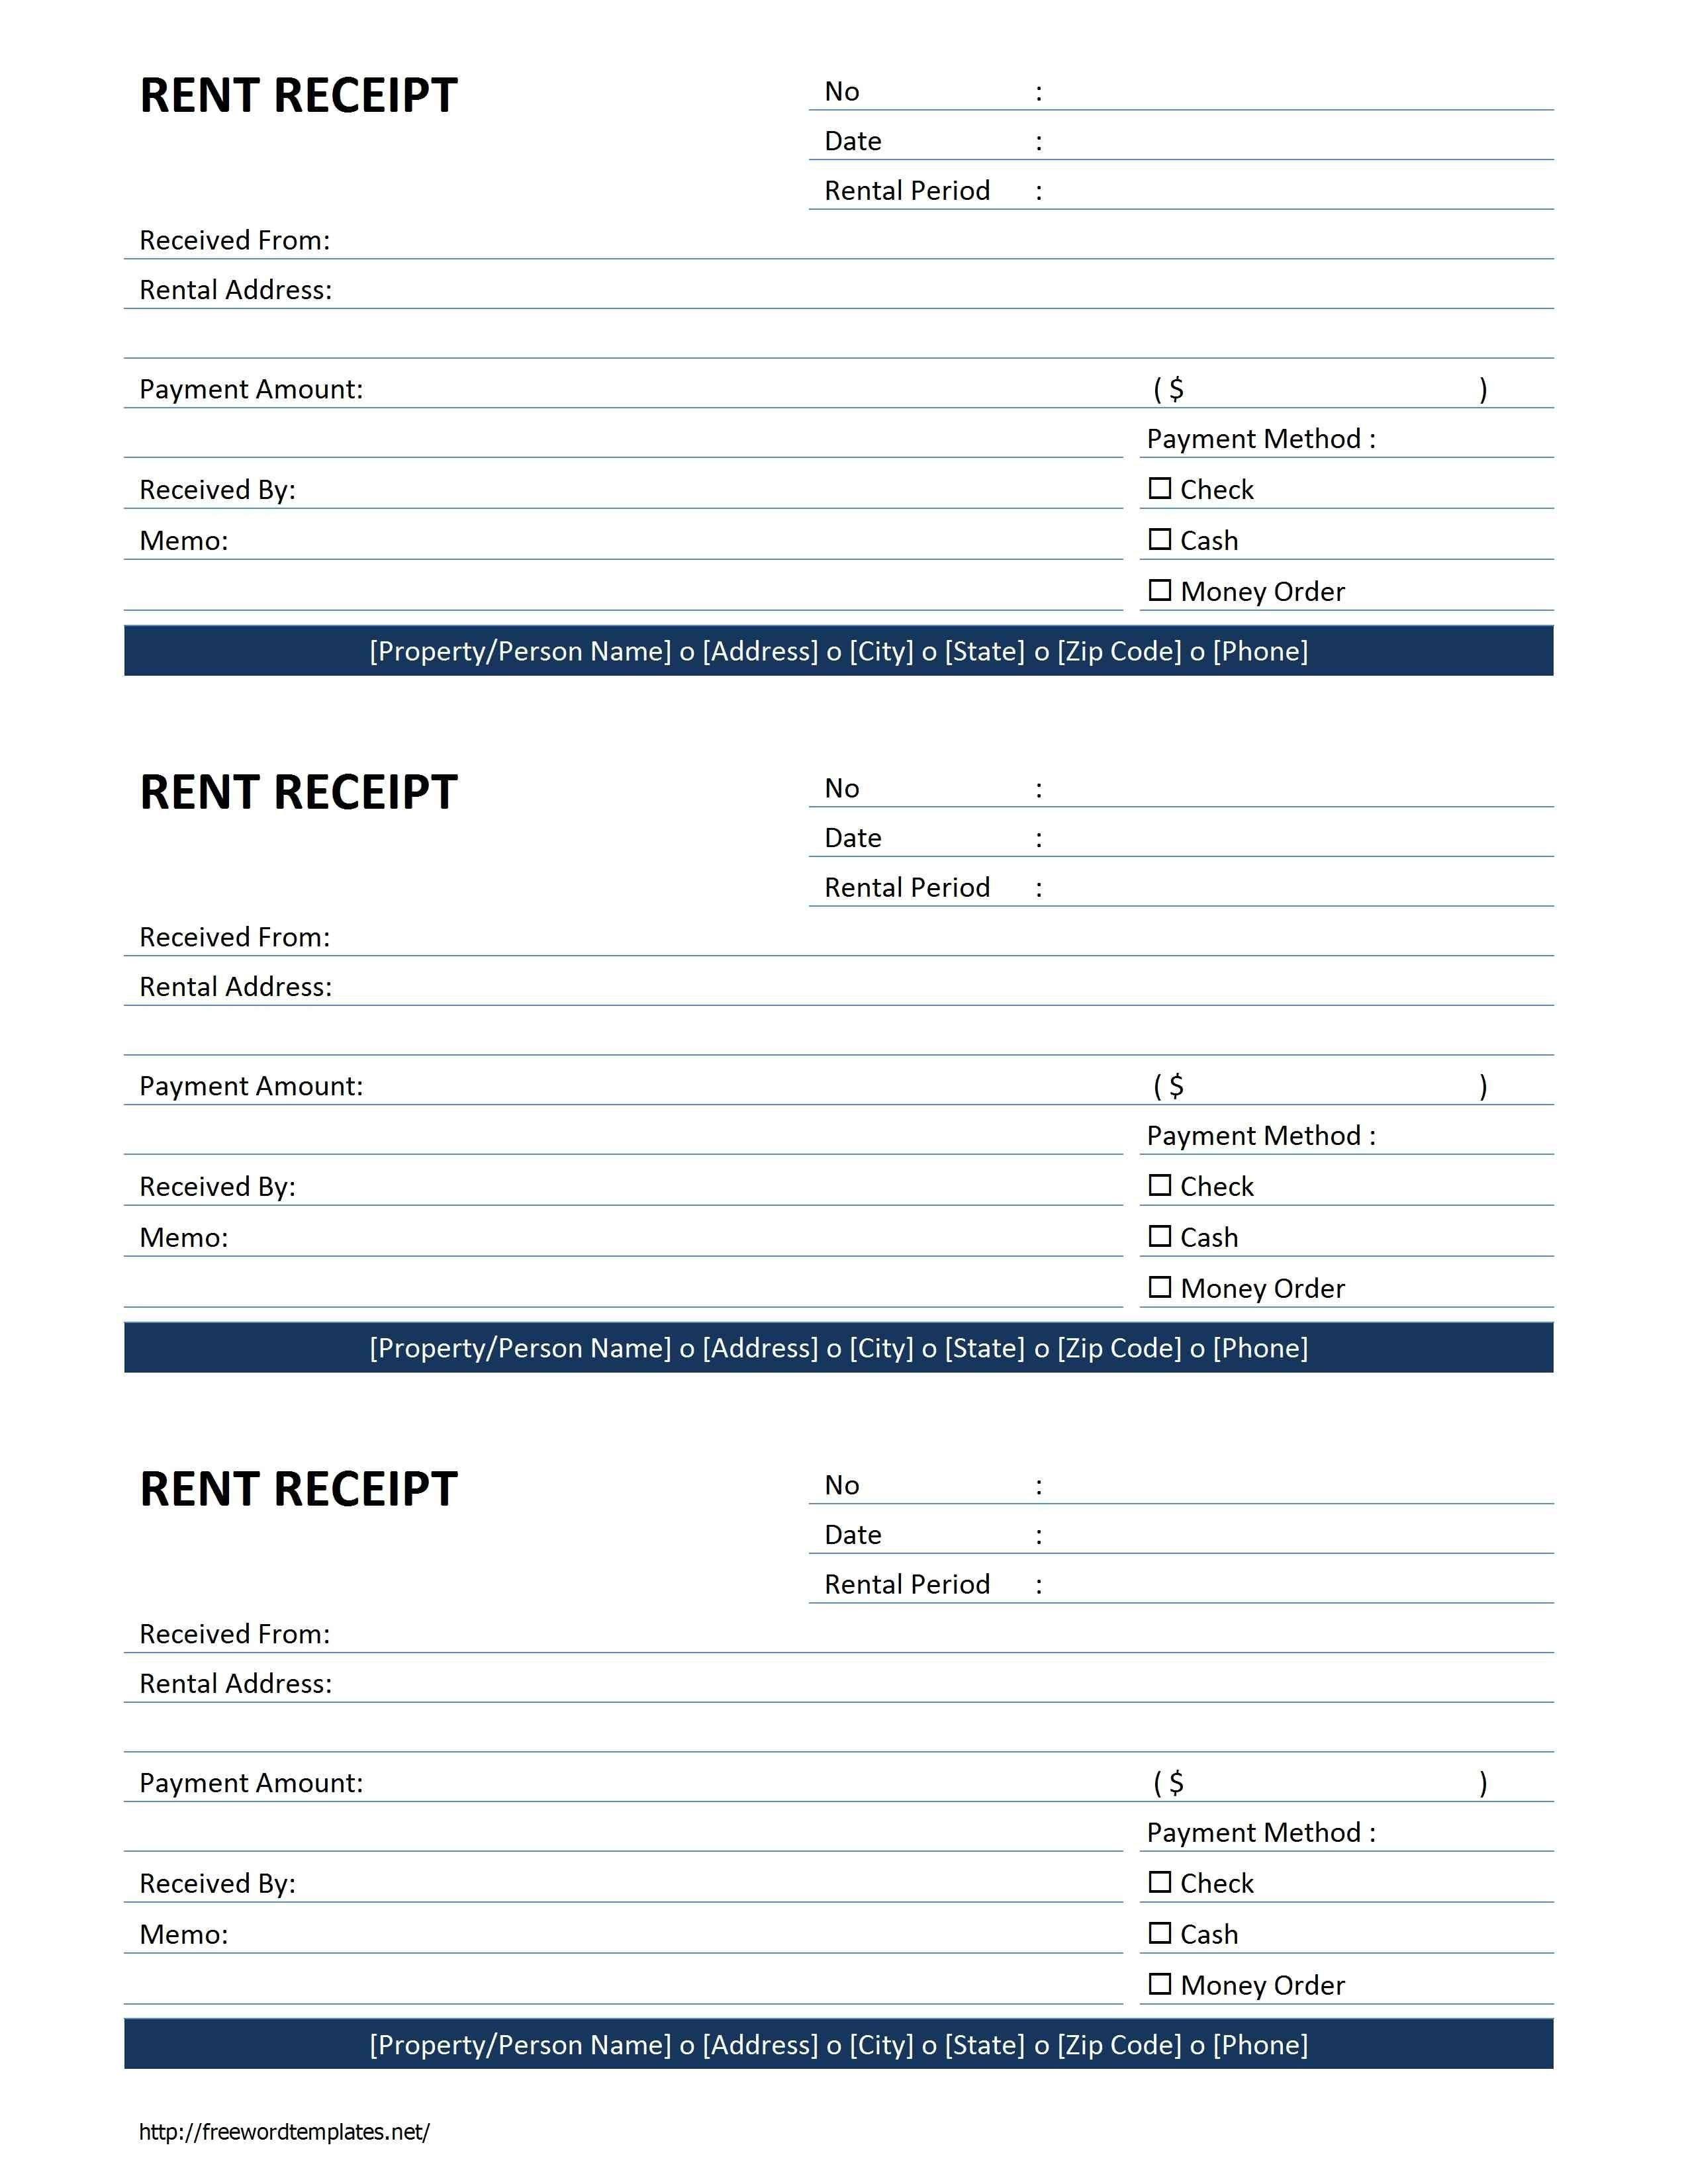 Unique Rent Billing Xls Xlsformat Xlstemplates Xlstemplate Check More At Https Mavensocial Co Rent Billing